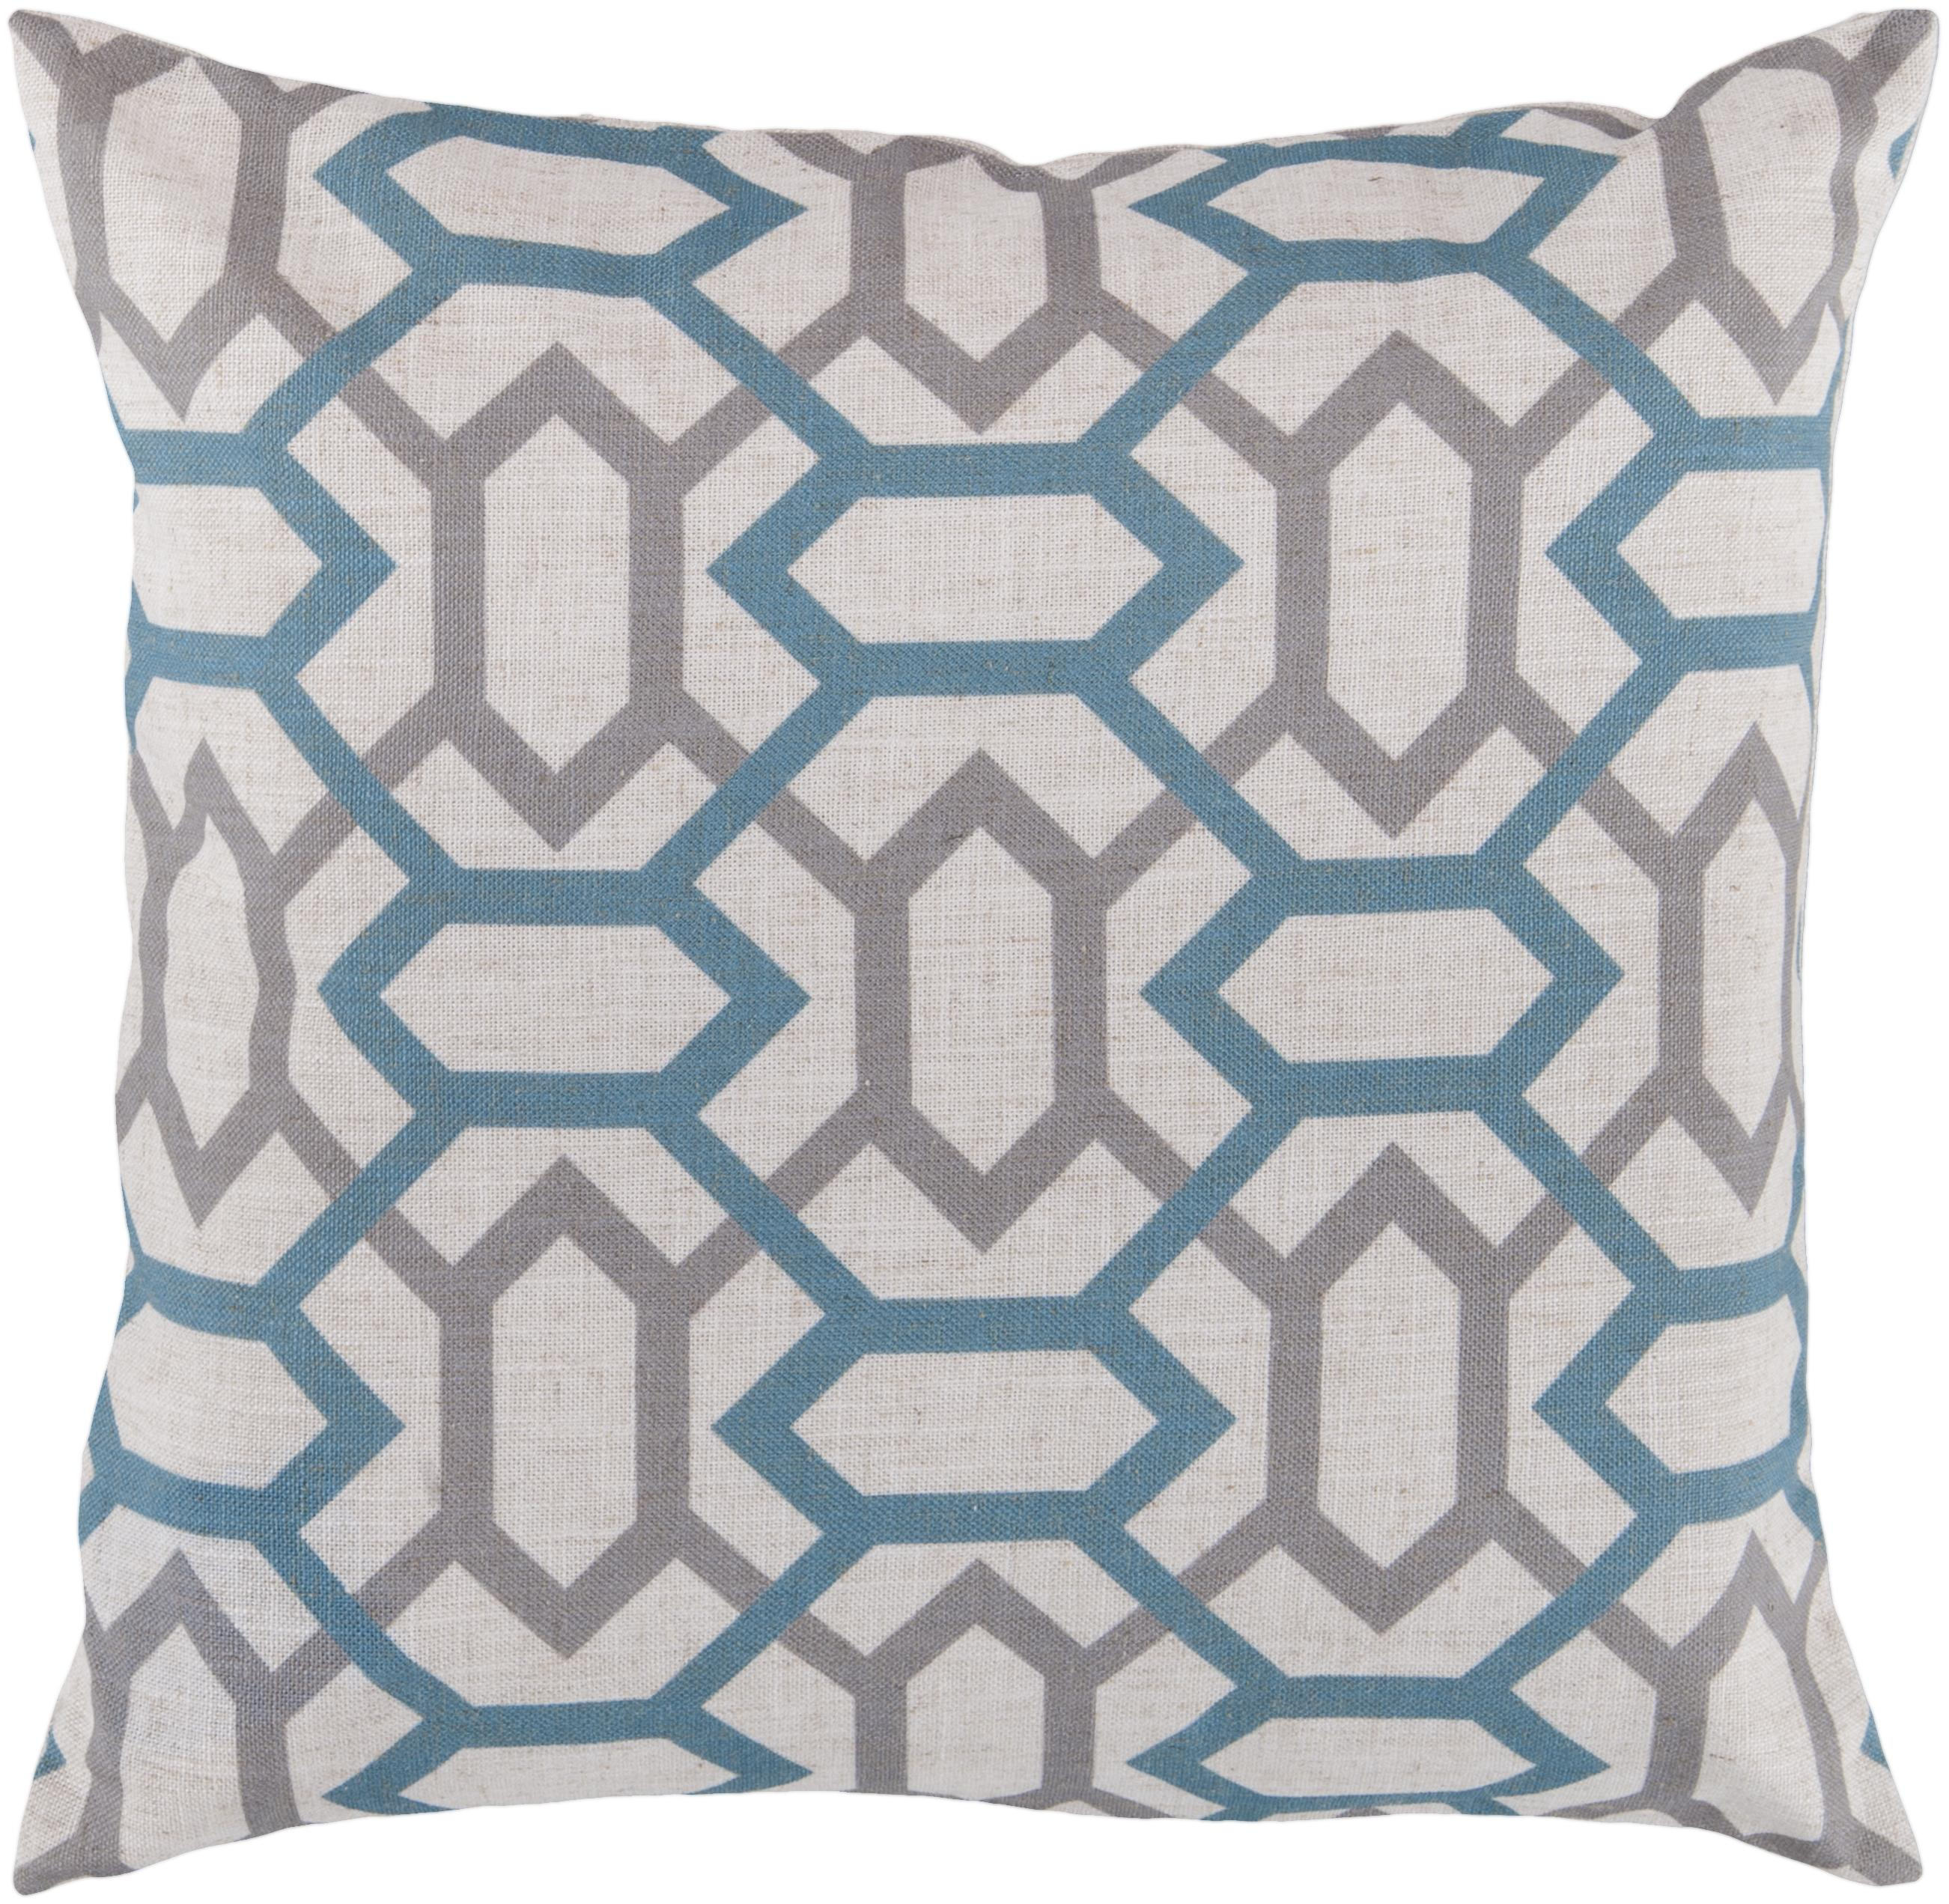 "Surya Rugs Pillows 22"" x 22"" Pillow - Item Number: FF008-2222P"